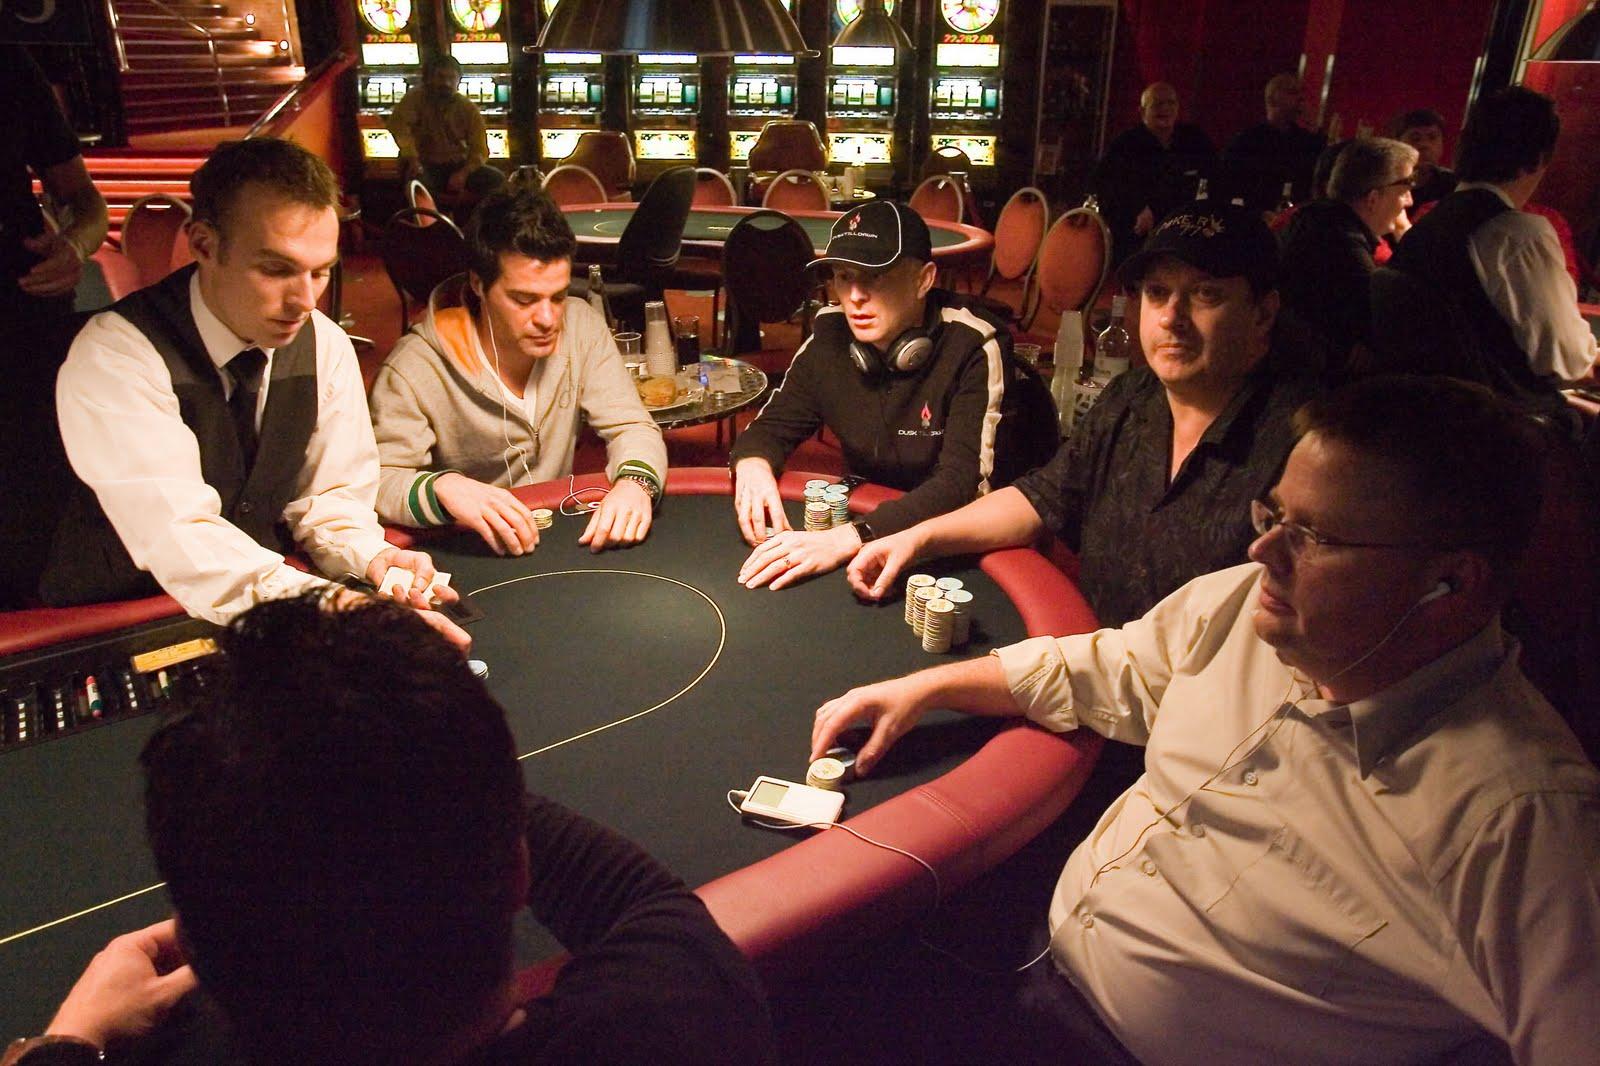 Jugar poker en internet